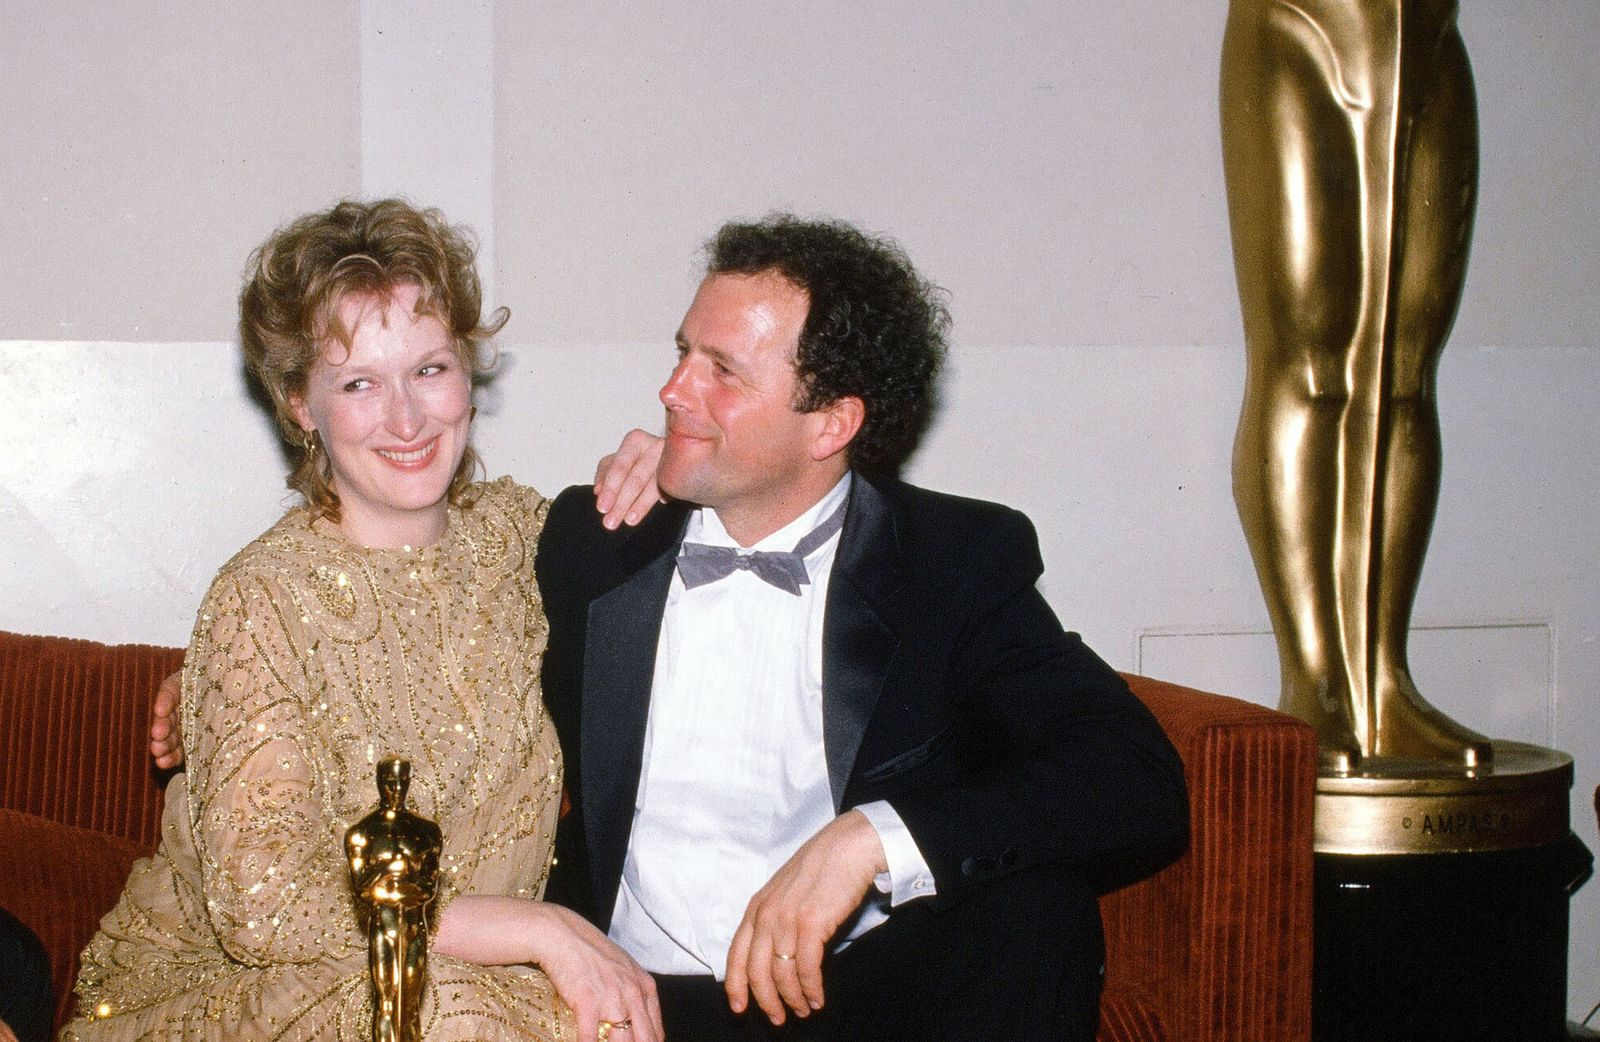 Мерил Стрип с мужем Доном Гаммером на премии «Оскар» 1983 года